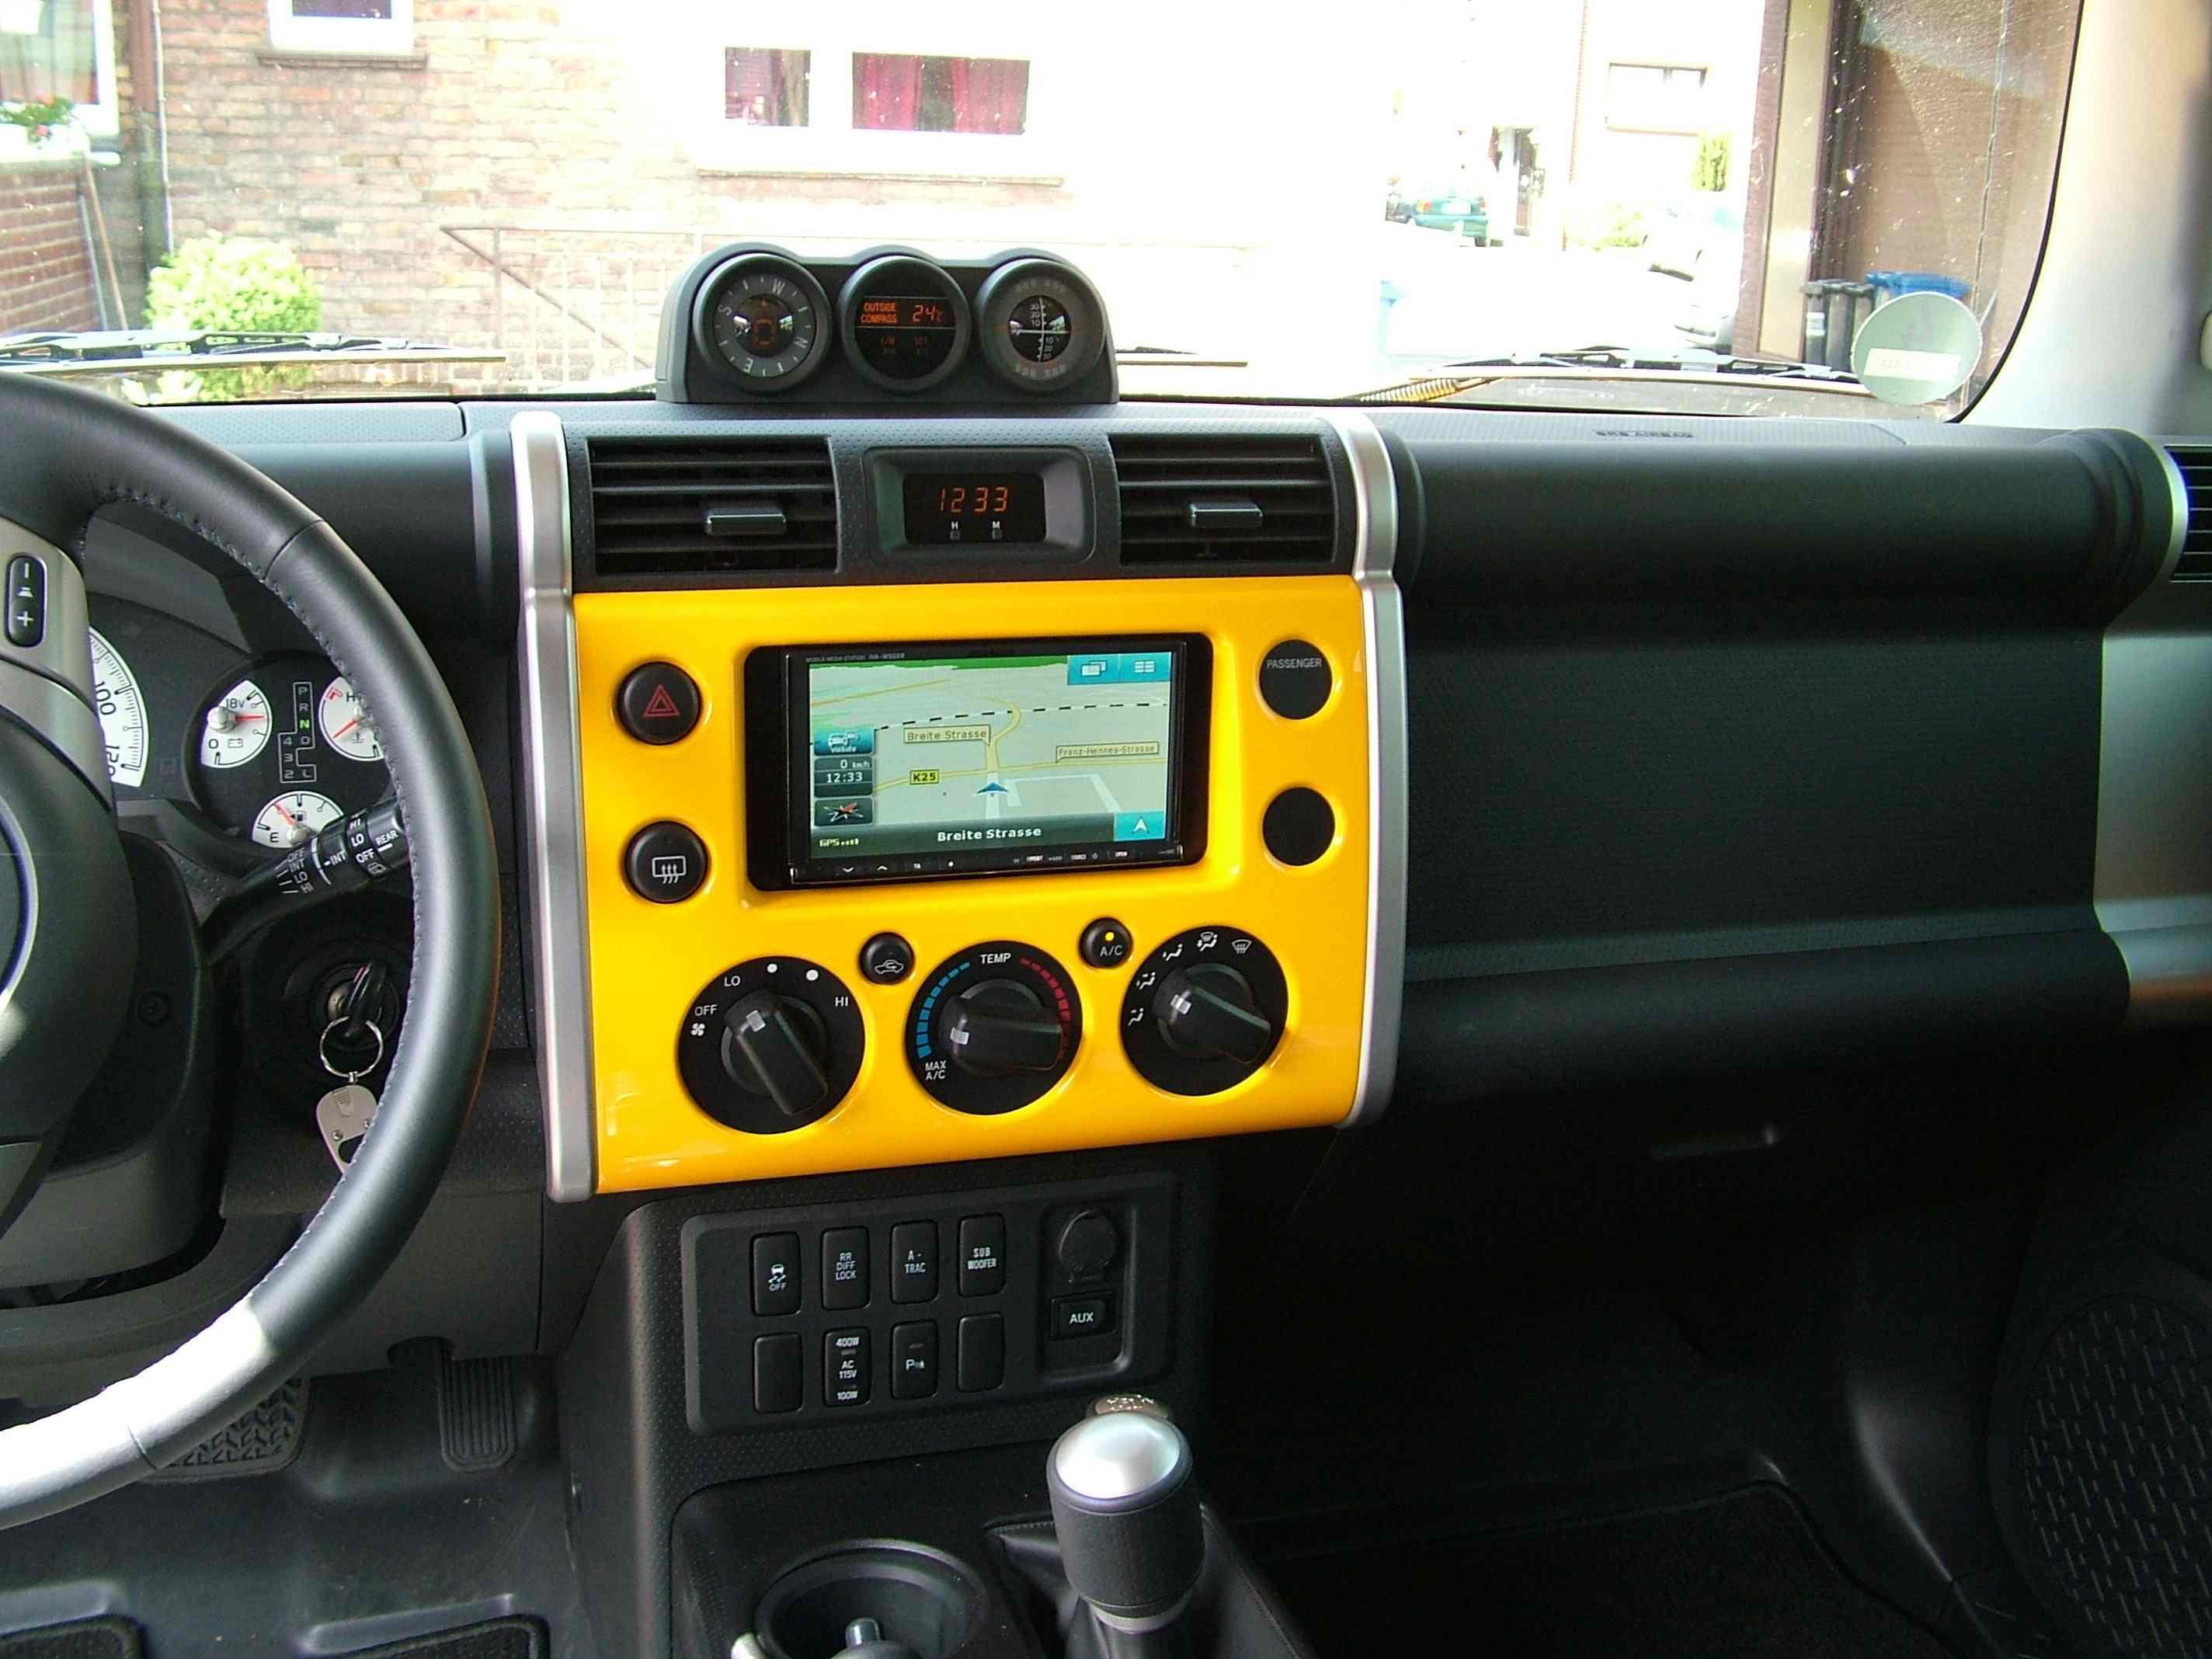 Toyota 2-DIN